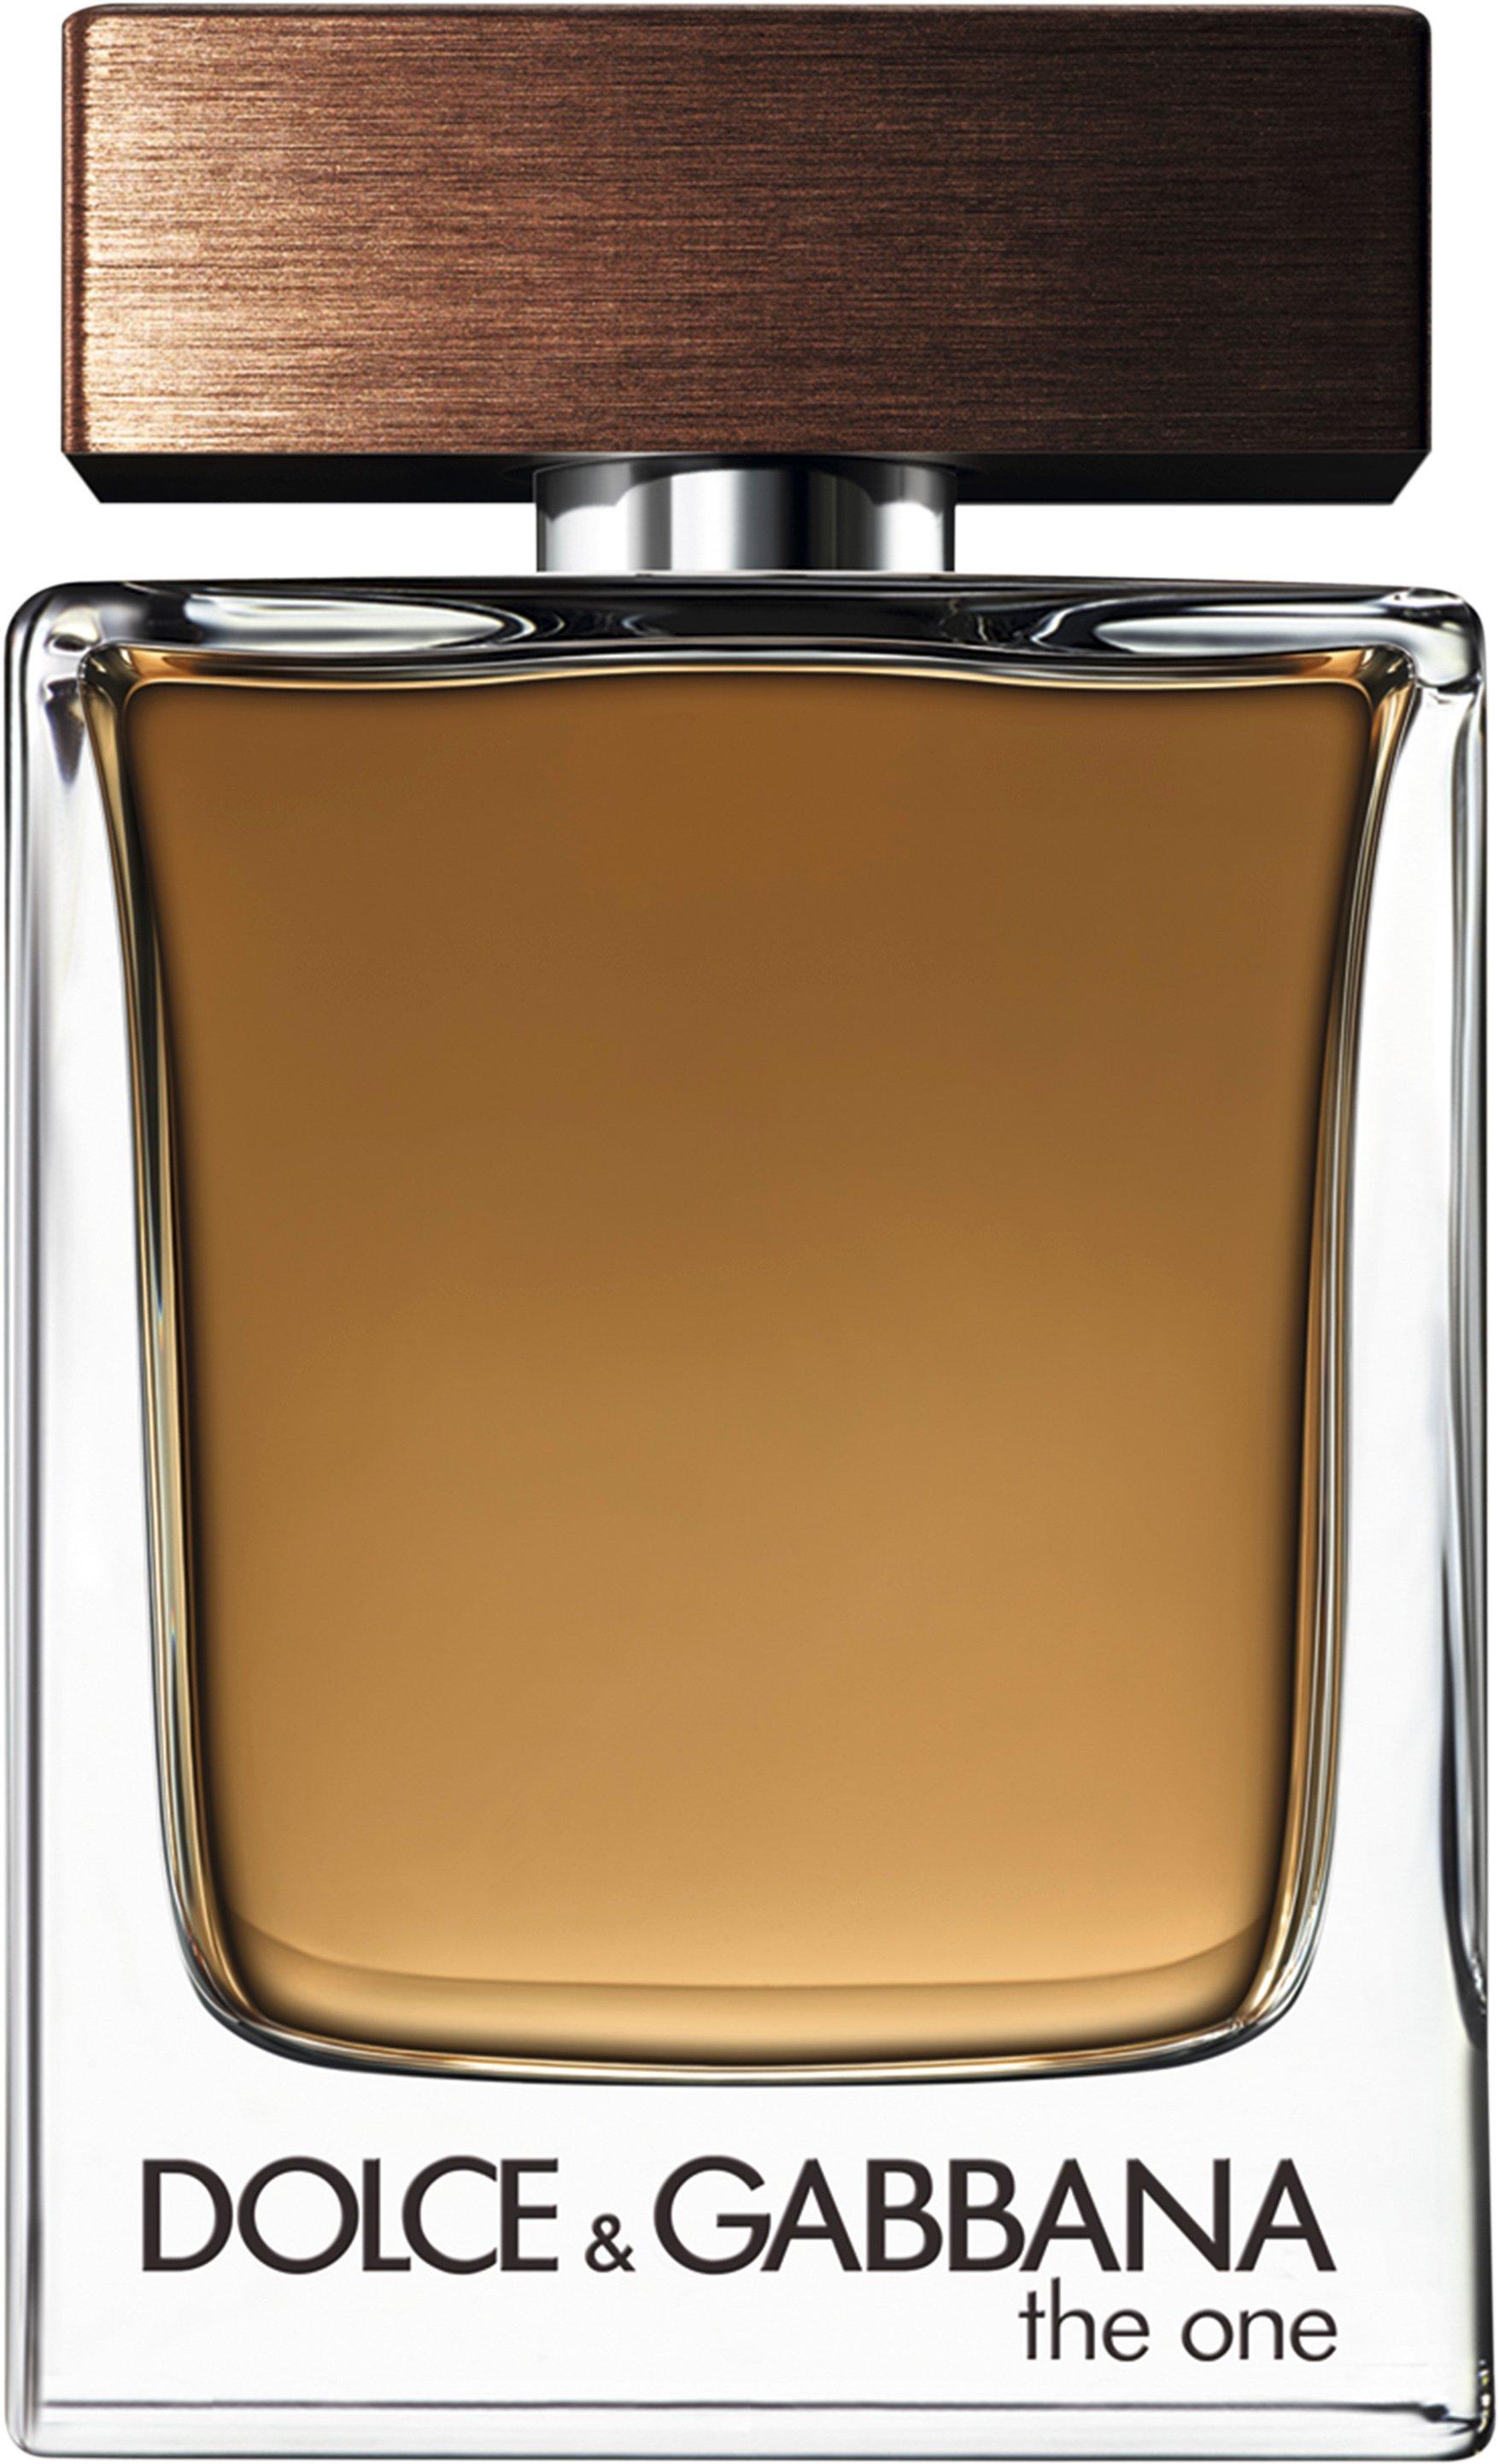 Dolce & Gabbana - The One For Men EDT 150 ml